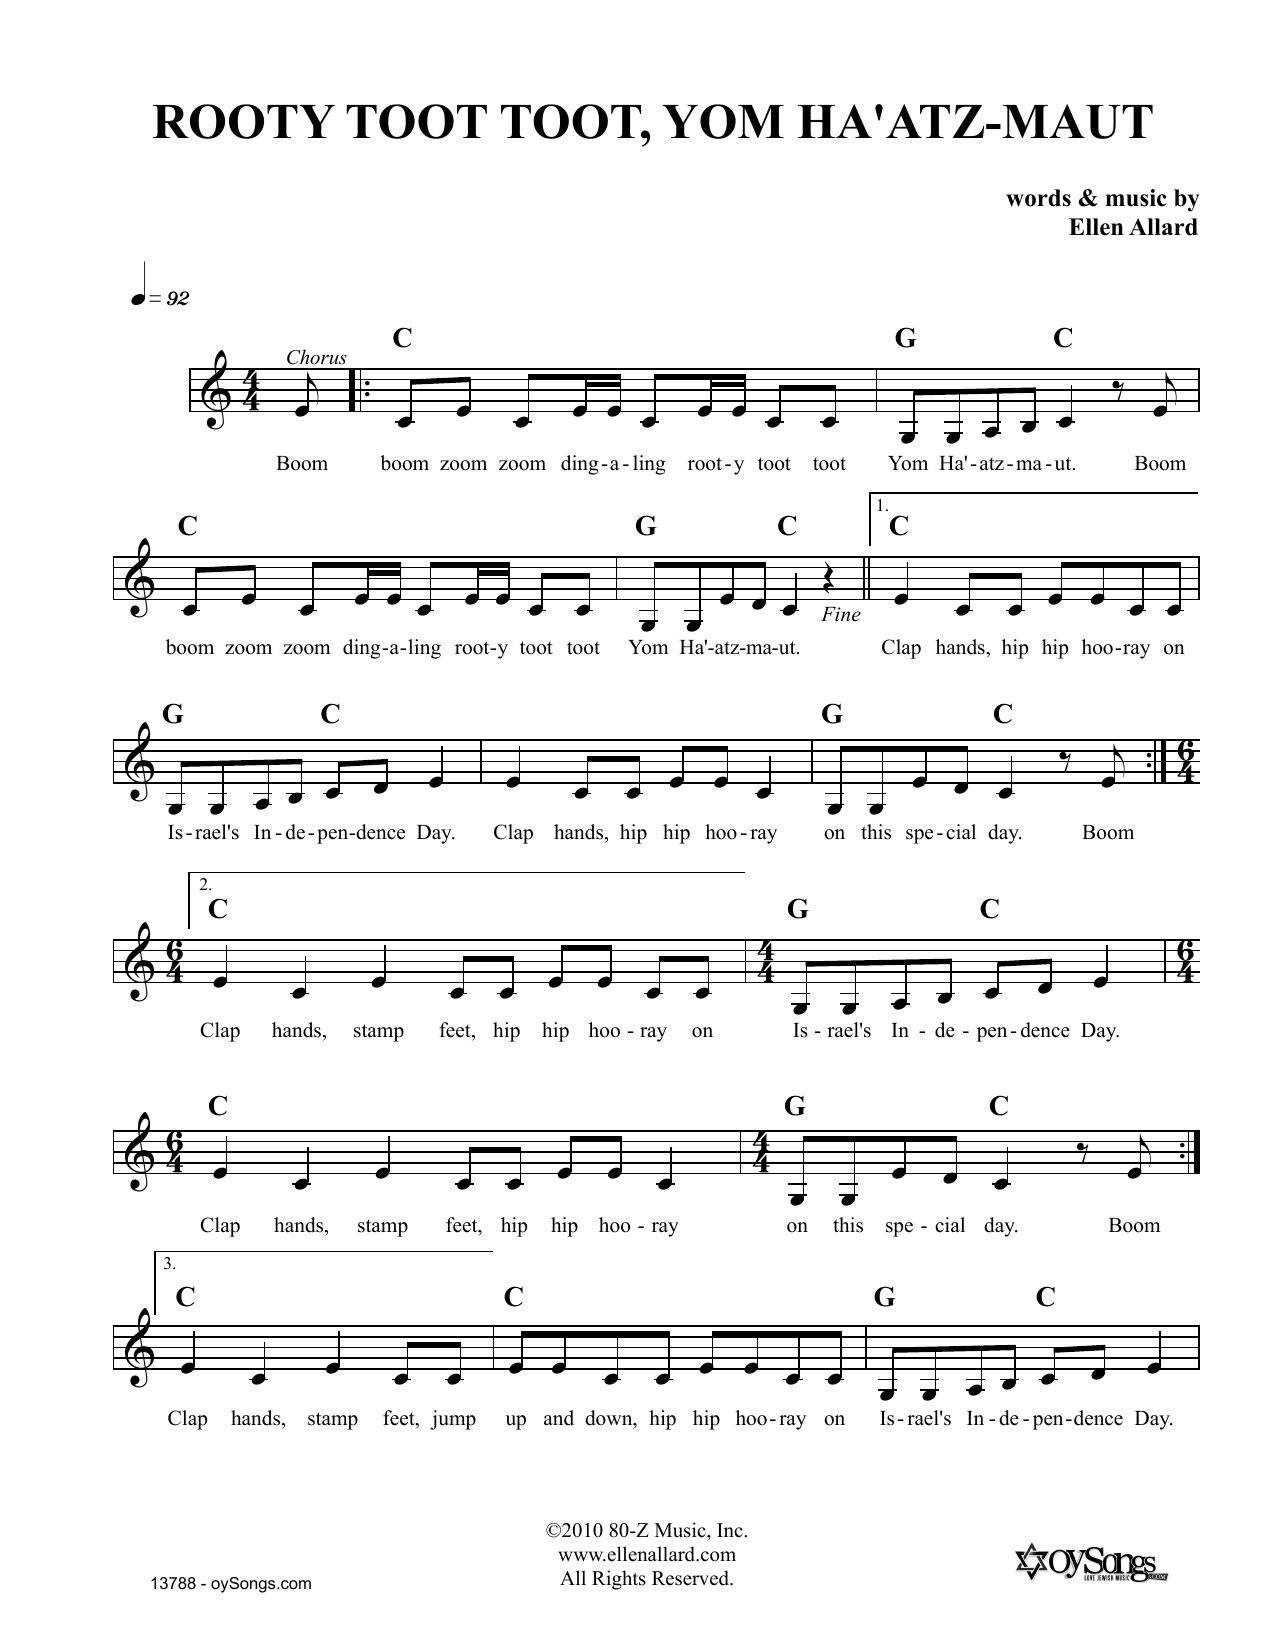 Rooty Toot Toot Yom Haatzmaut Sheet Music